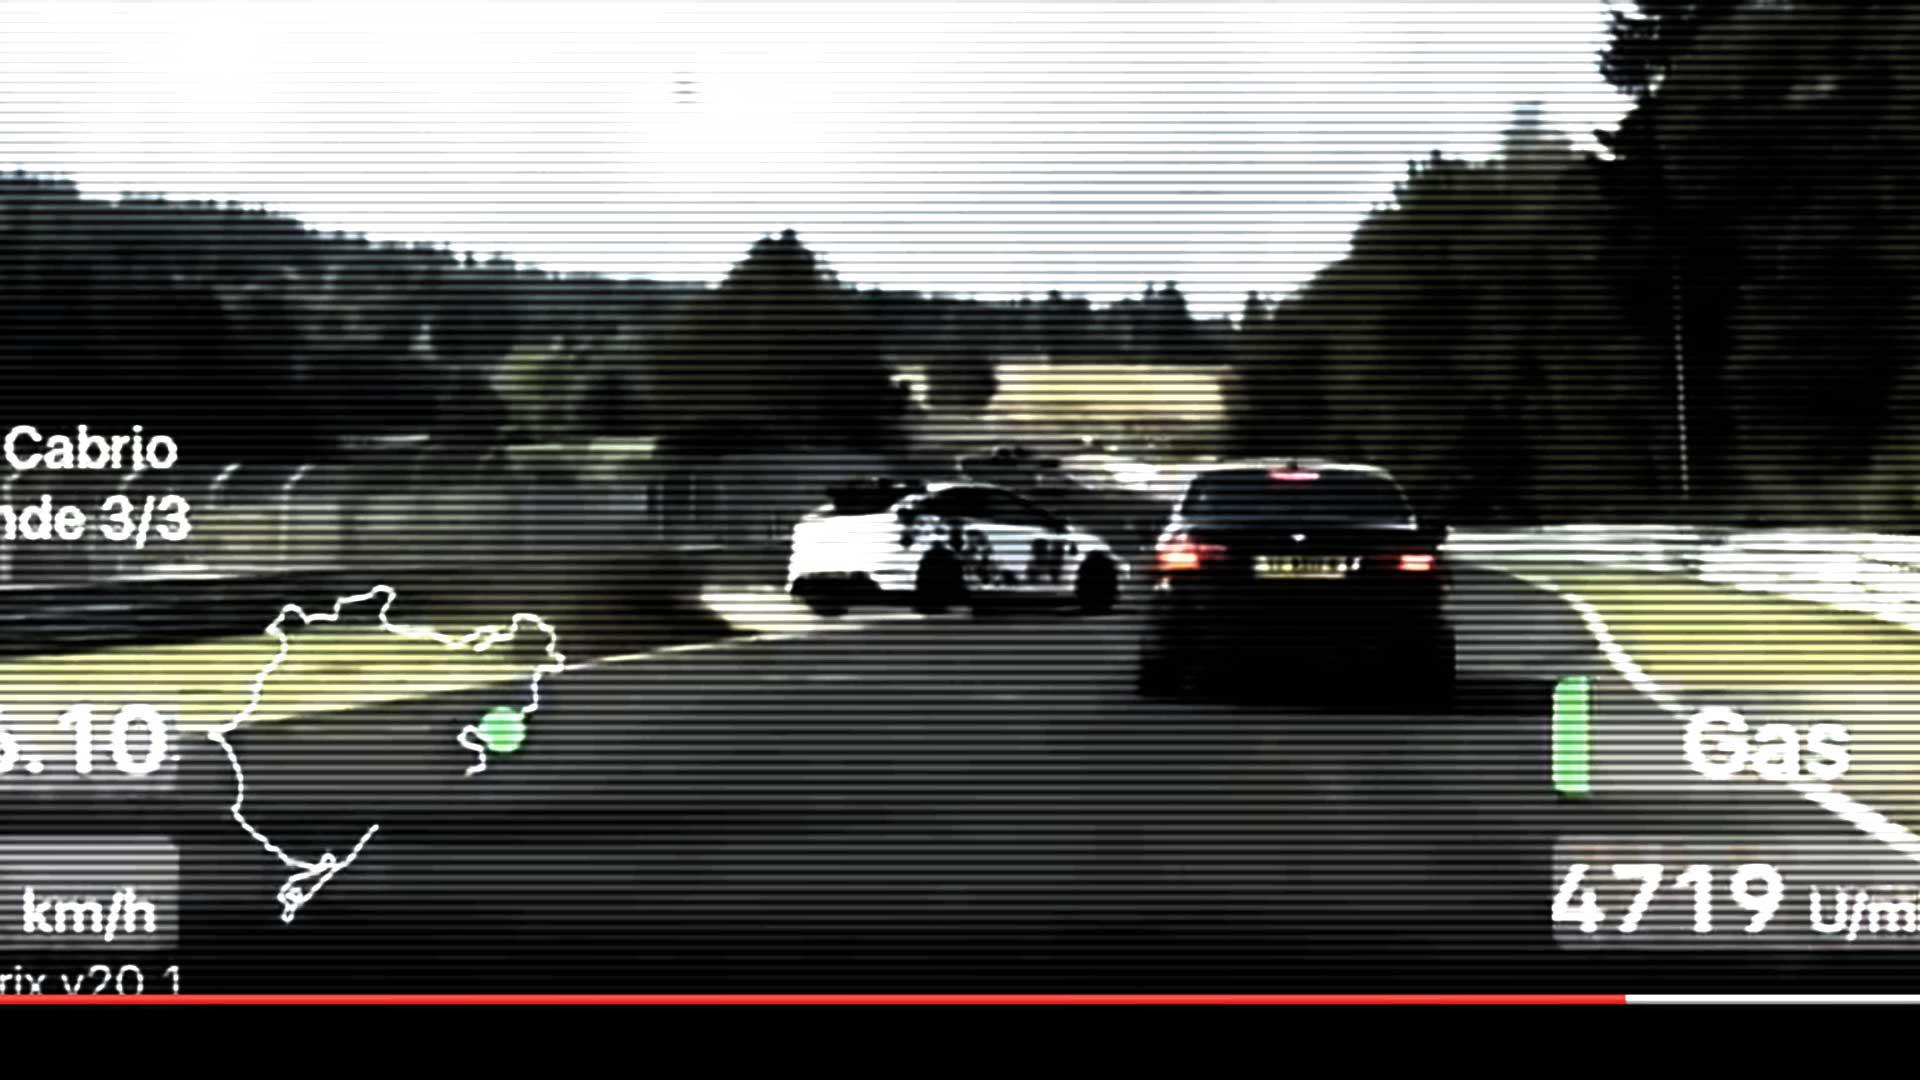 Ford Focus RS crash nurburgring Nordschleife